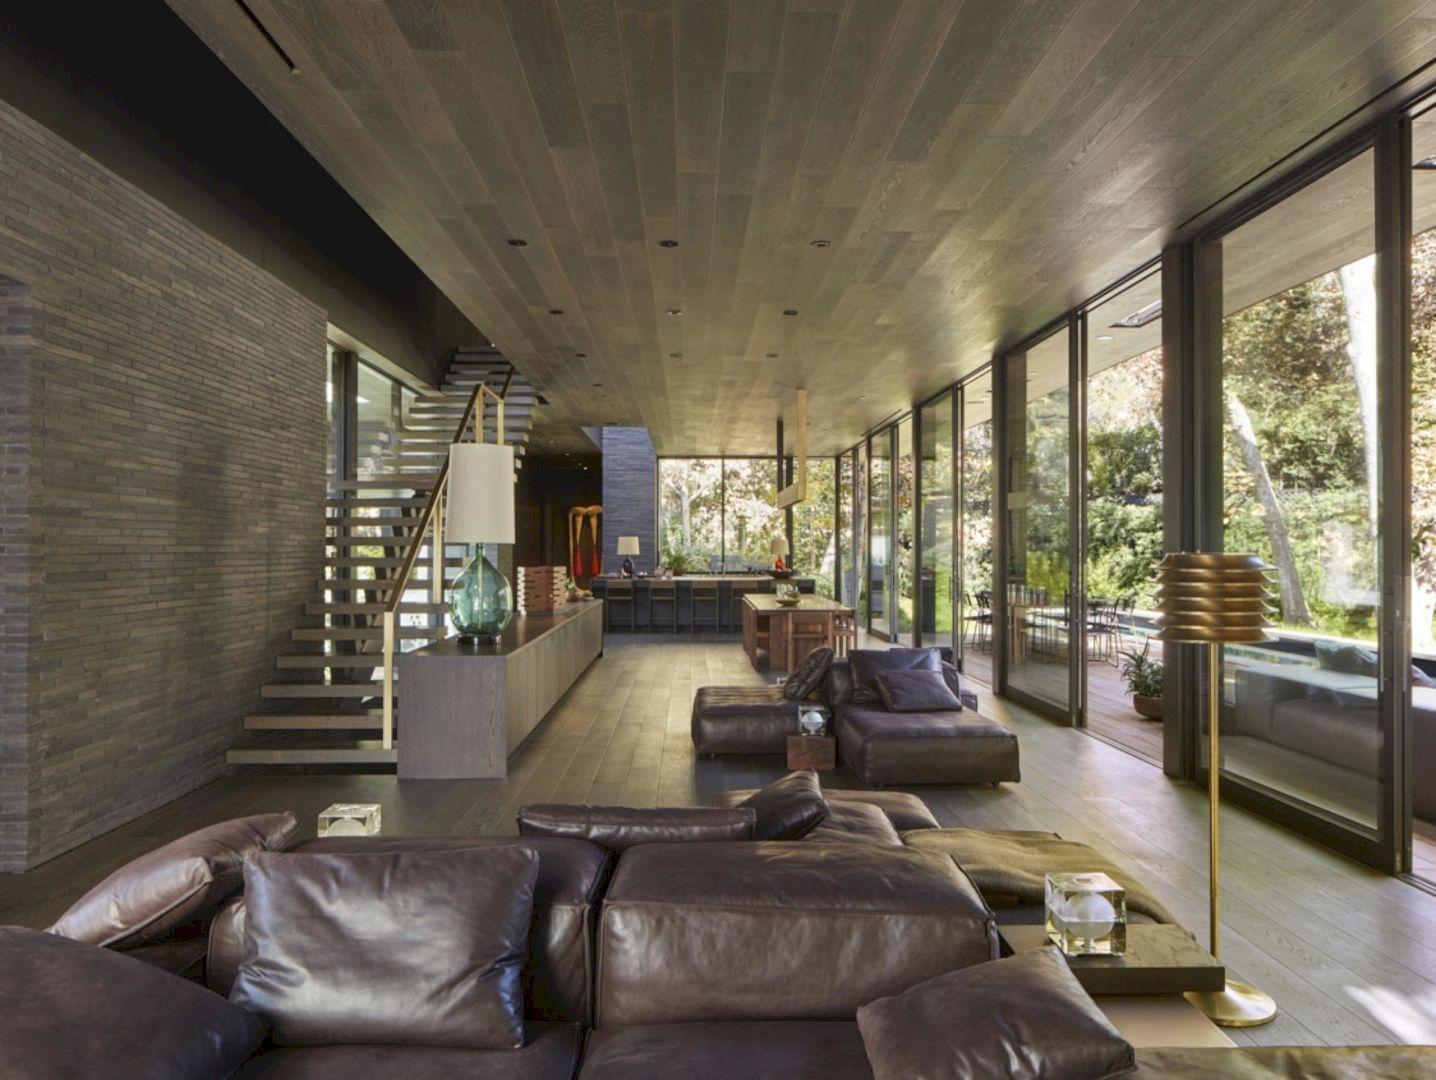 Mandeville Canyon By Marmol Radziner Architecture 2